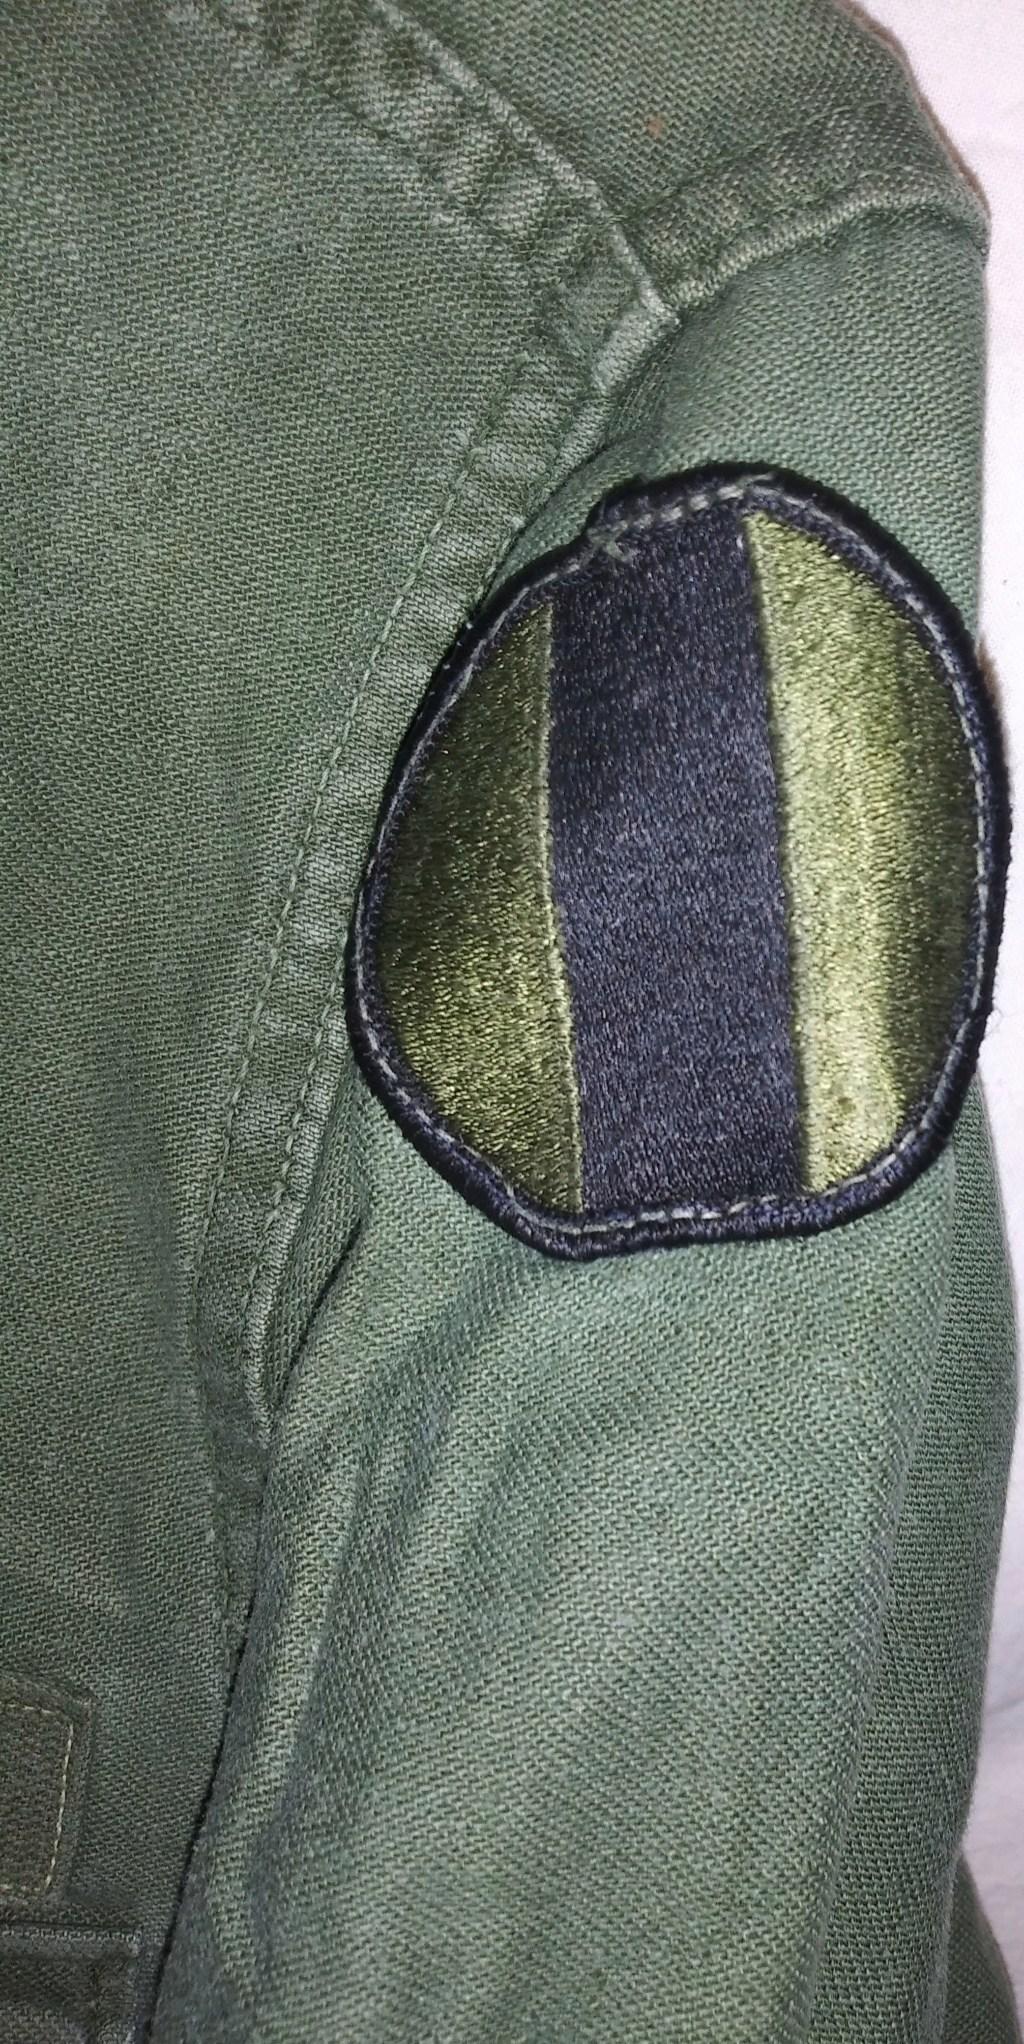 A few Vietnam War era Army Shirts and Jackets 20191234